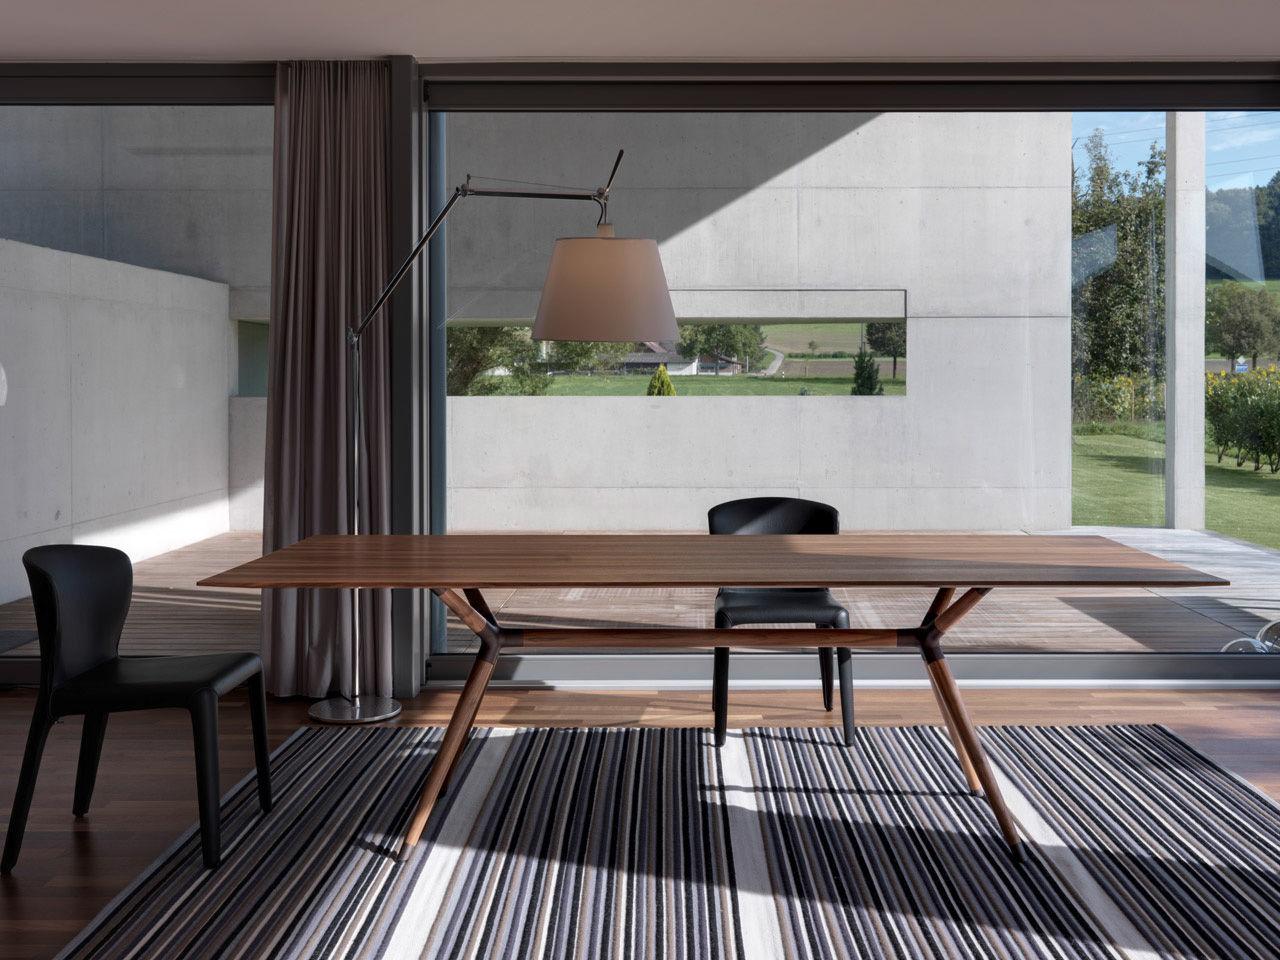 moderner tisch / holz / stahl / rechteckig - x2 - mobimex - Moderner Esstisch Holz Stahl